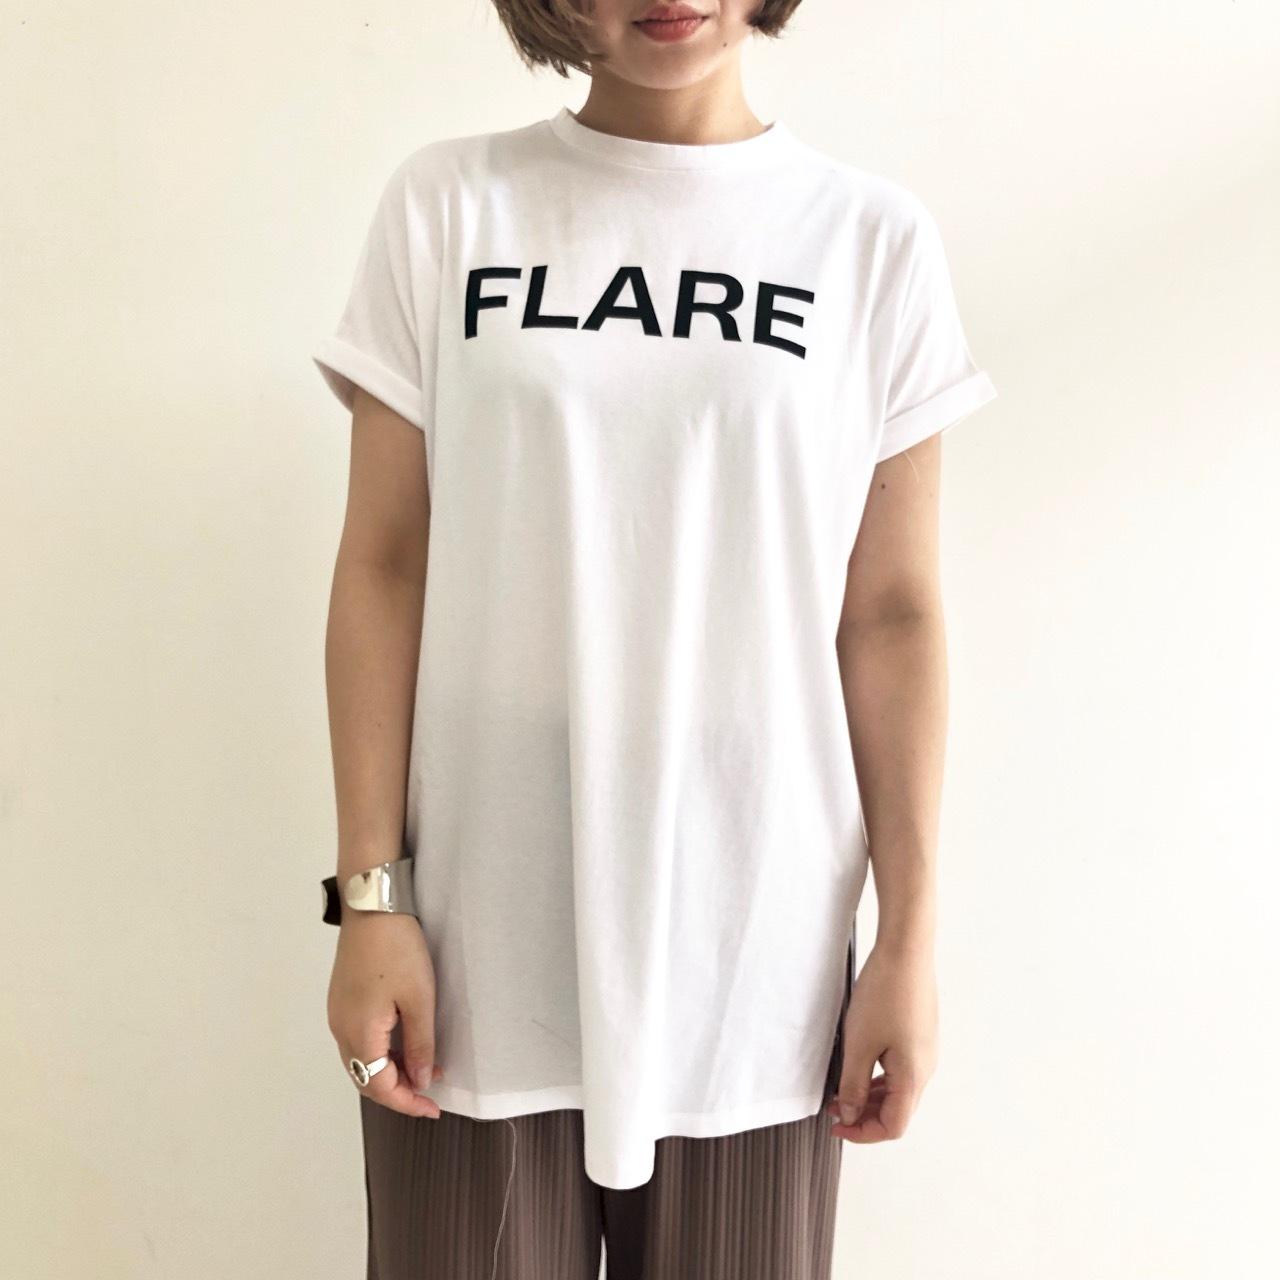 【 ROSIEE 】- 152605 - FLARE Teeシャツ